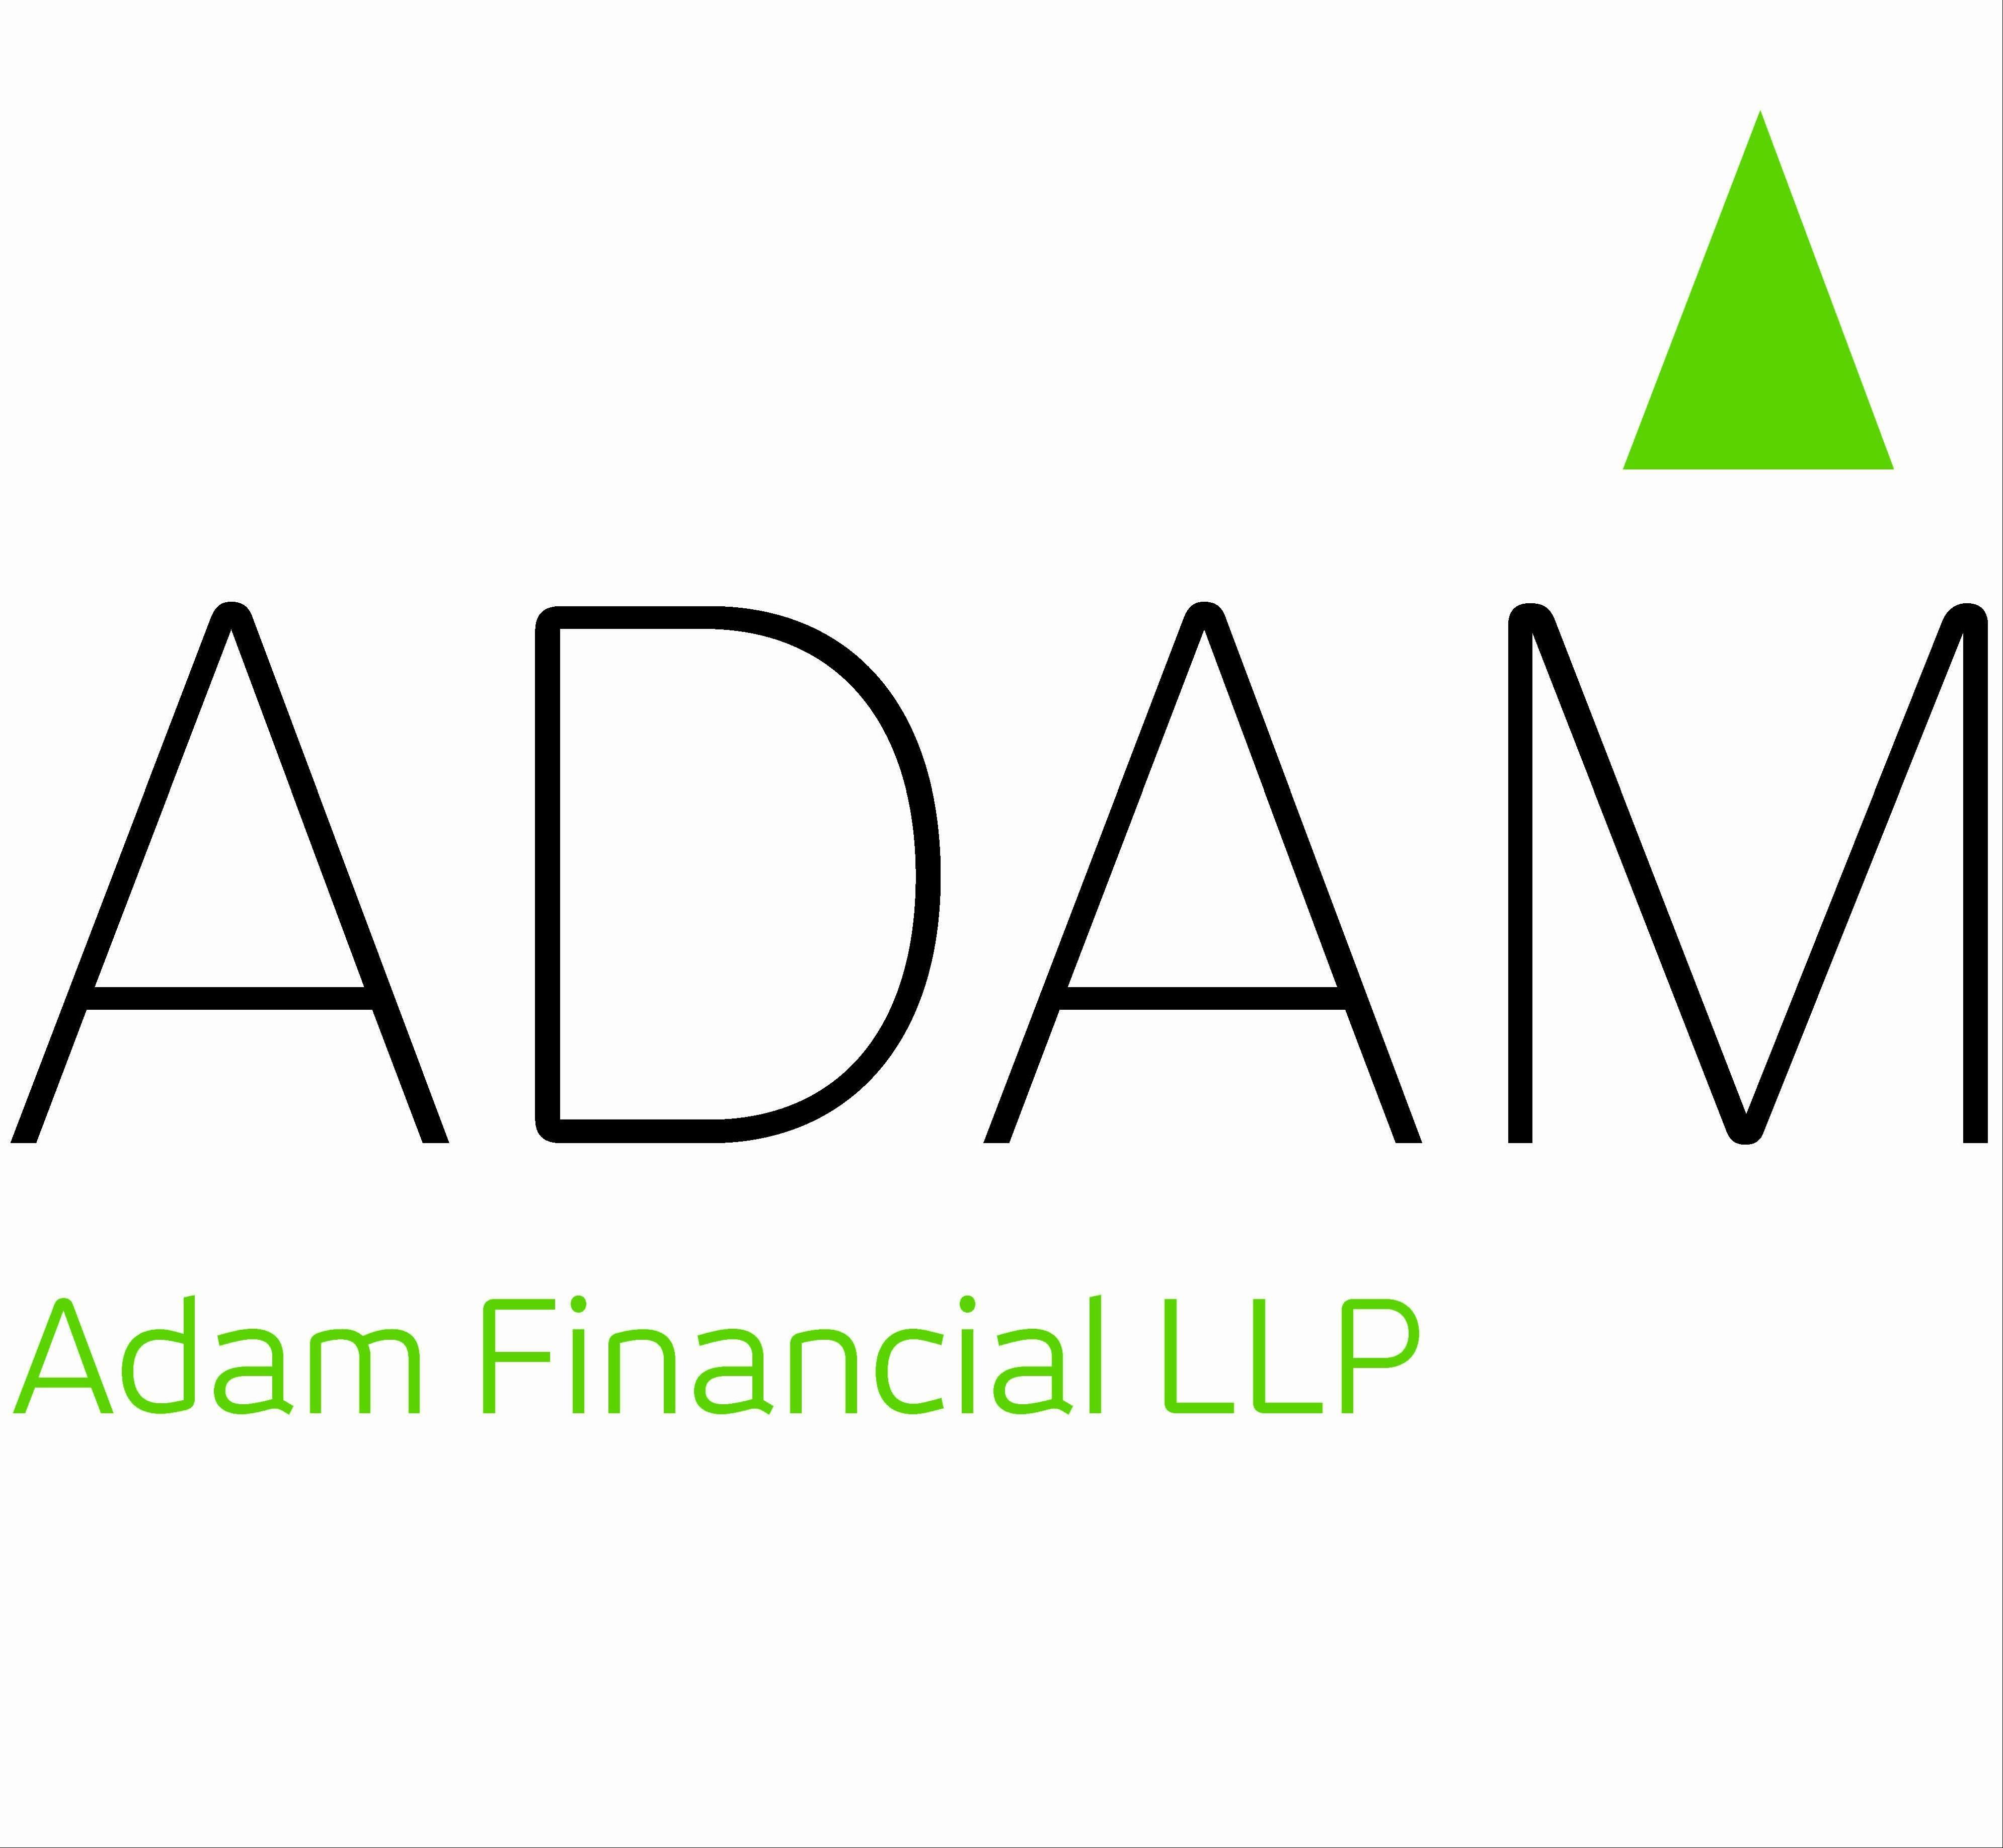 Company Logo Adam Financial, LLP